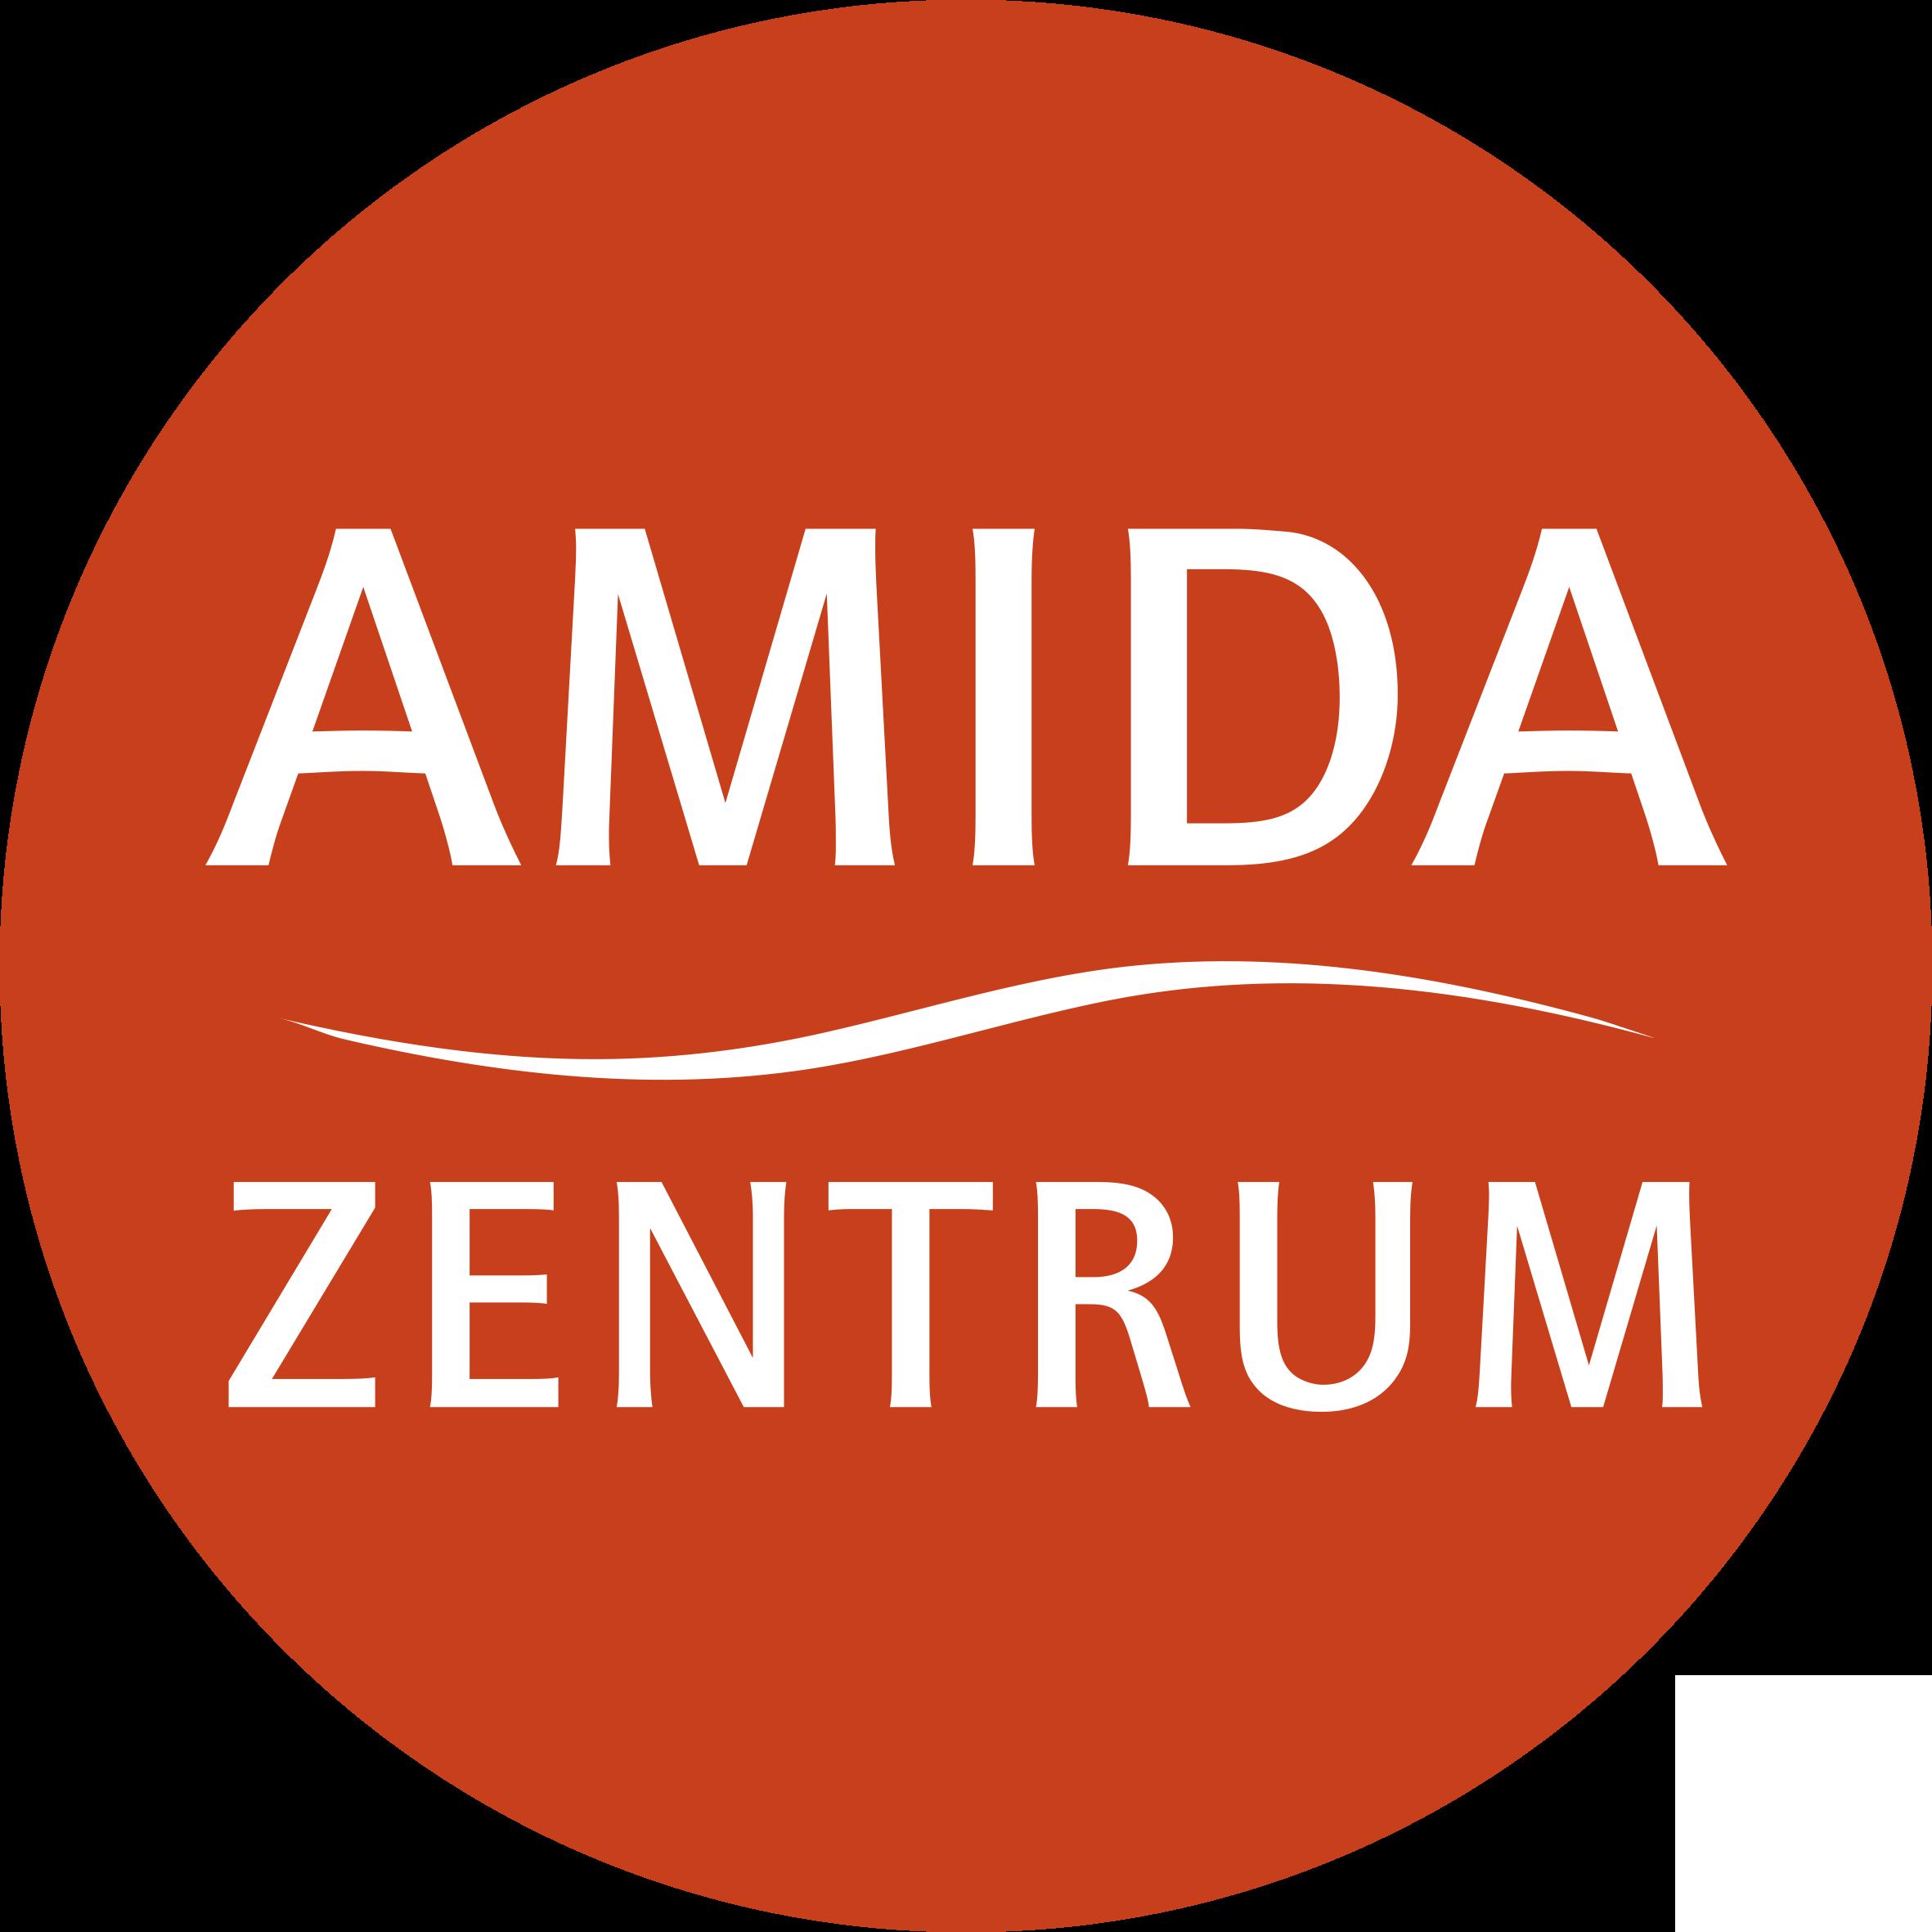 Amida Zentrum